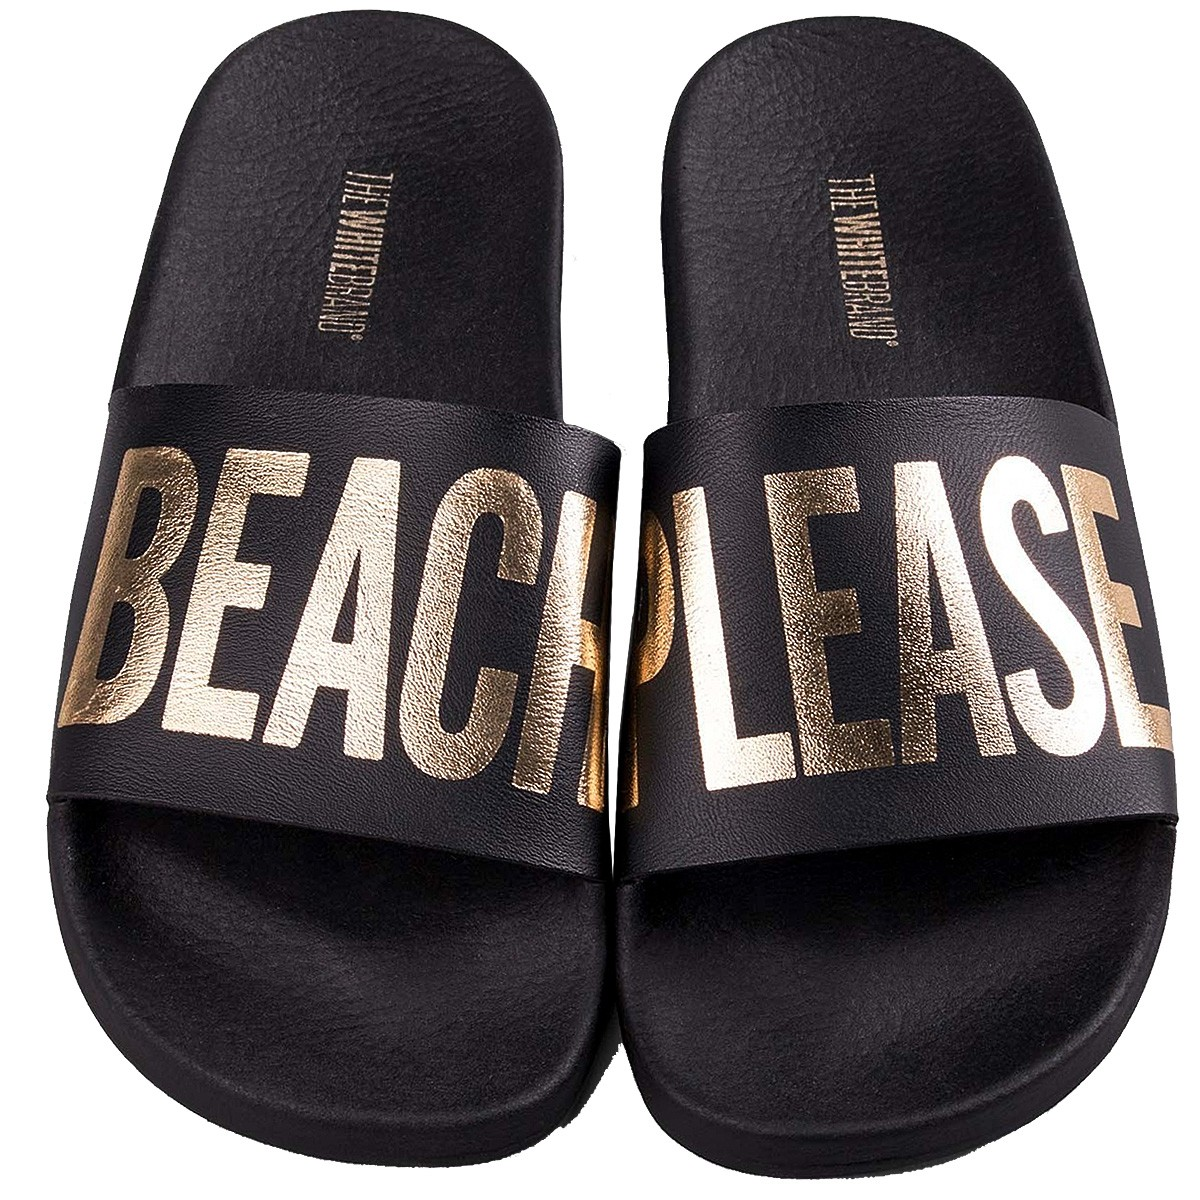 9e32dbd9c81e4 Platform The White Brand Beach Please Woman - Casual shoes